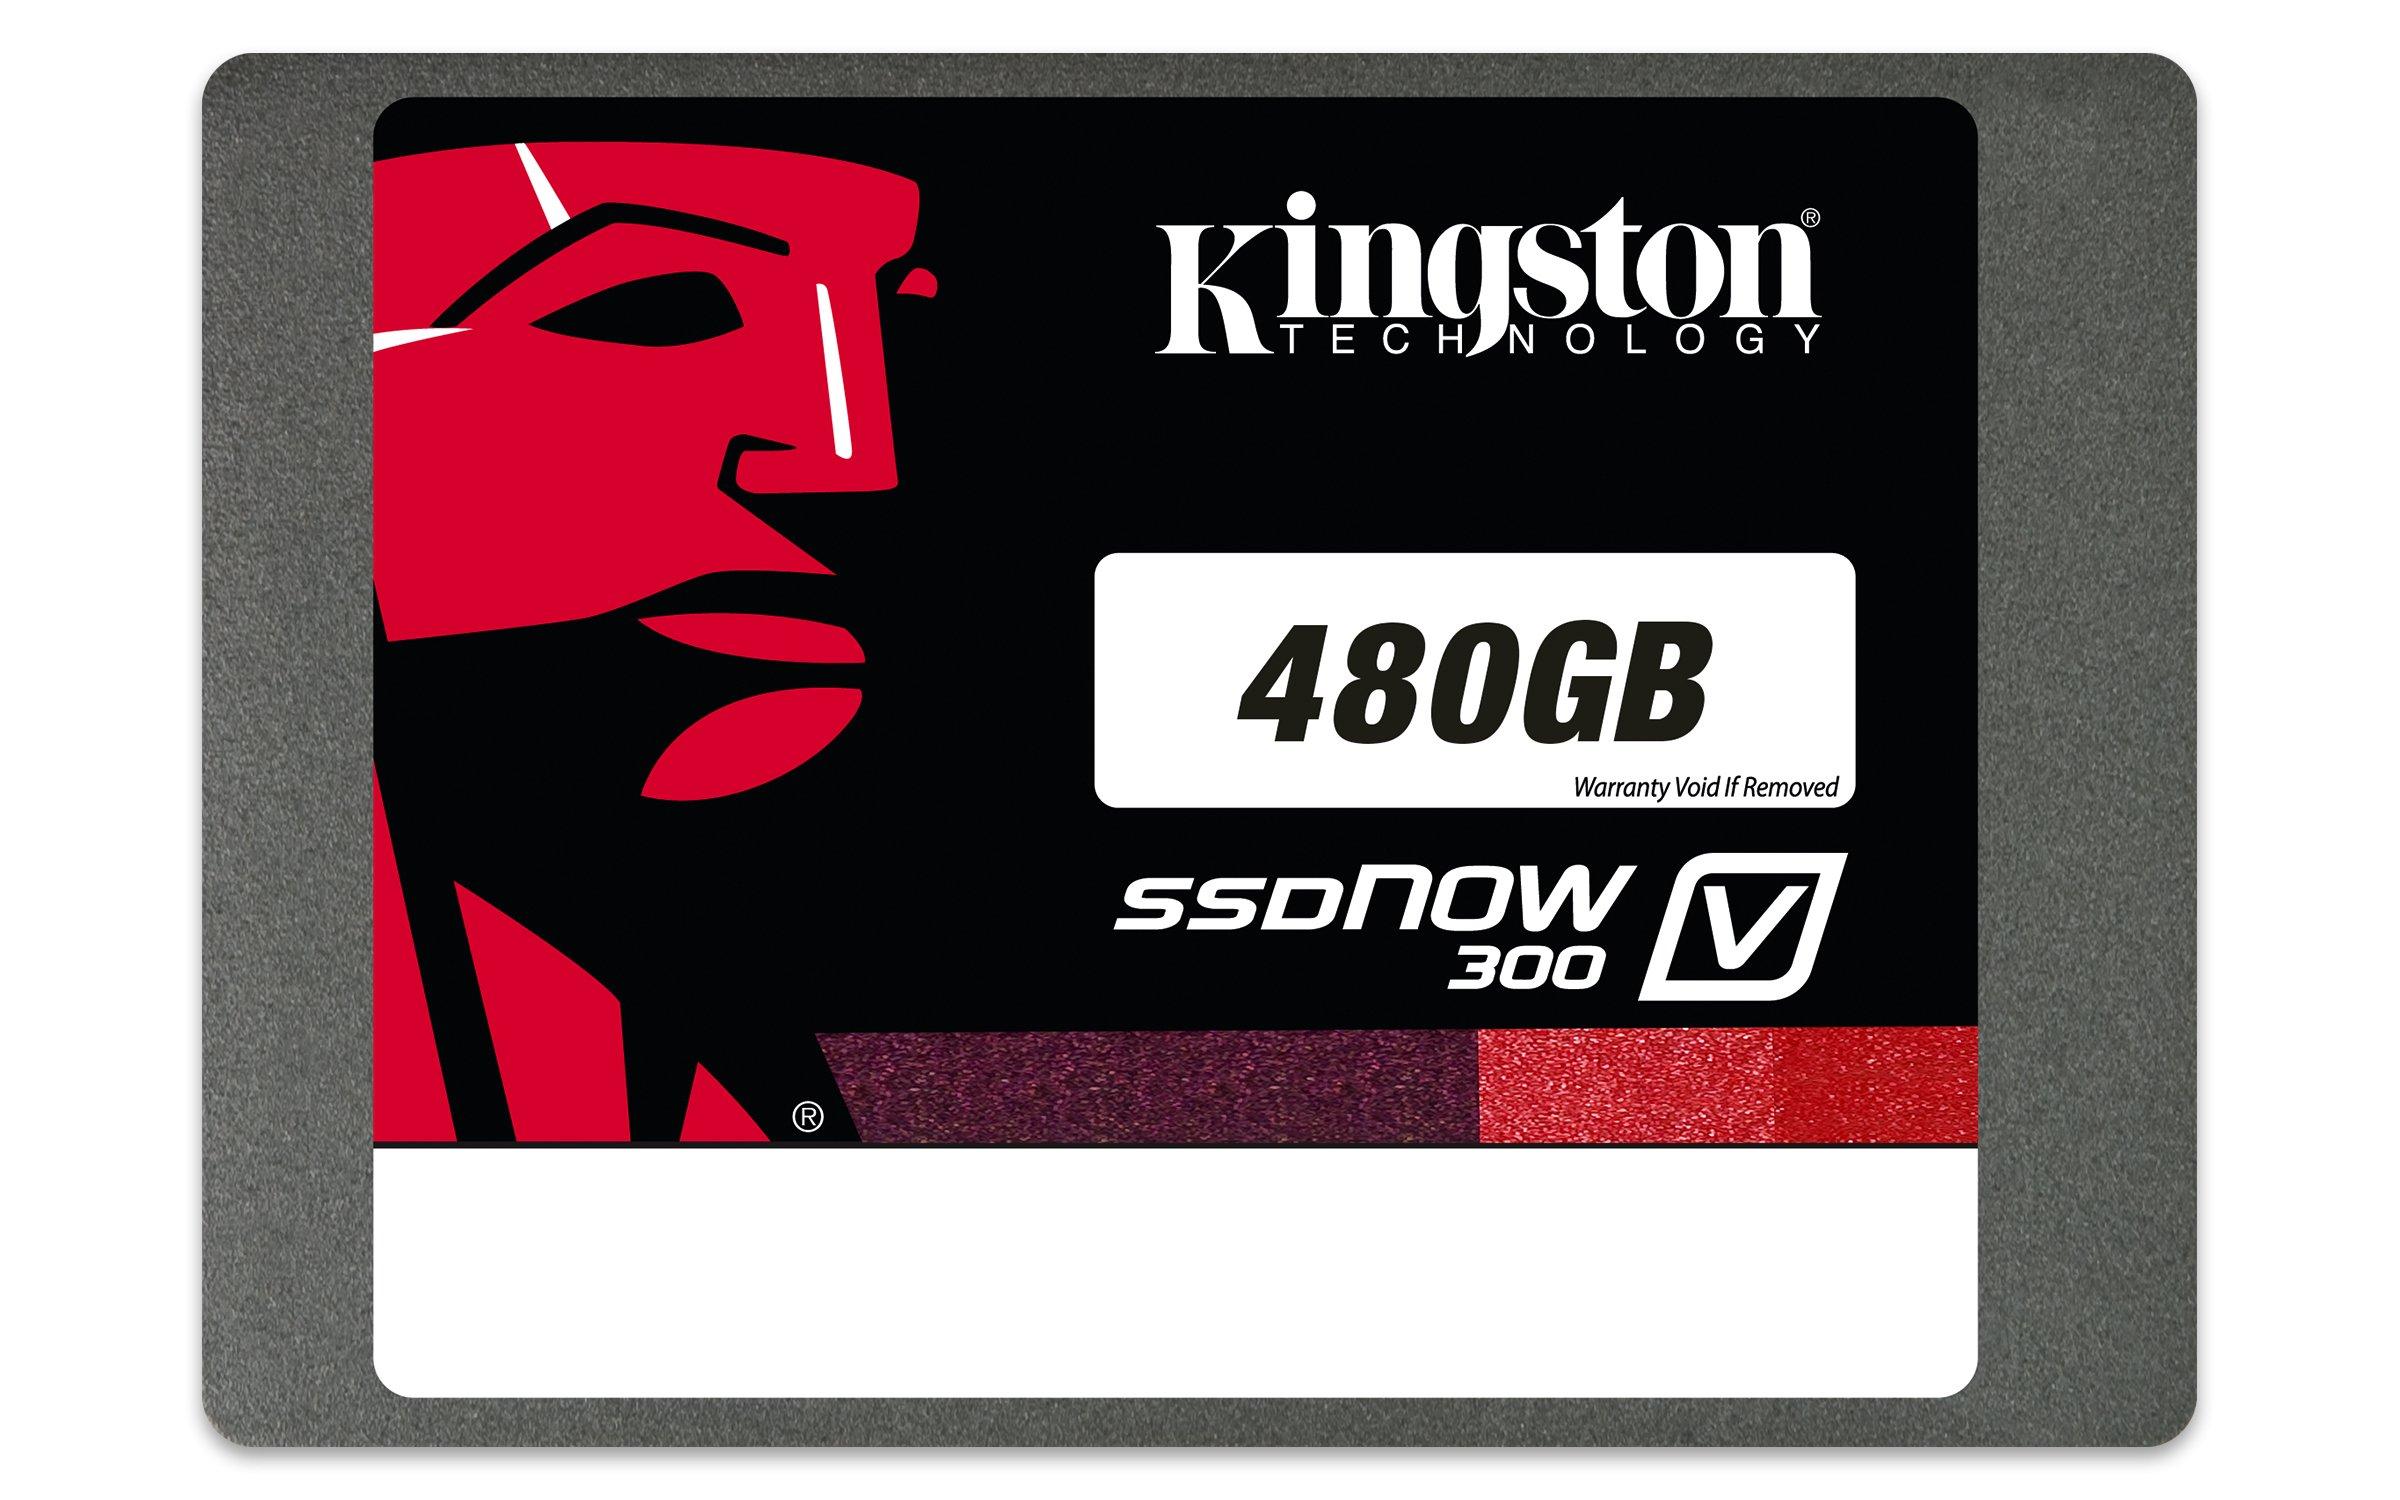 Kingston 480GB